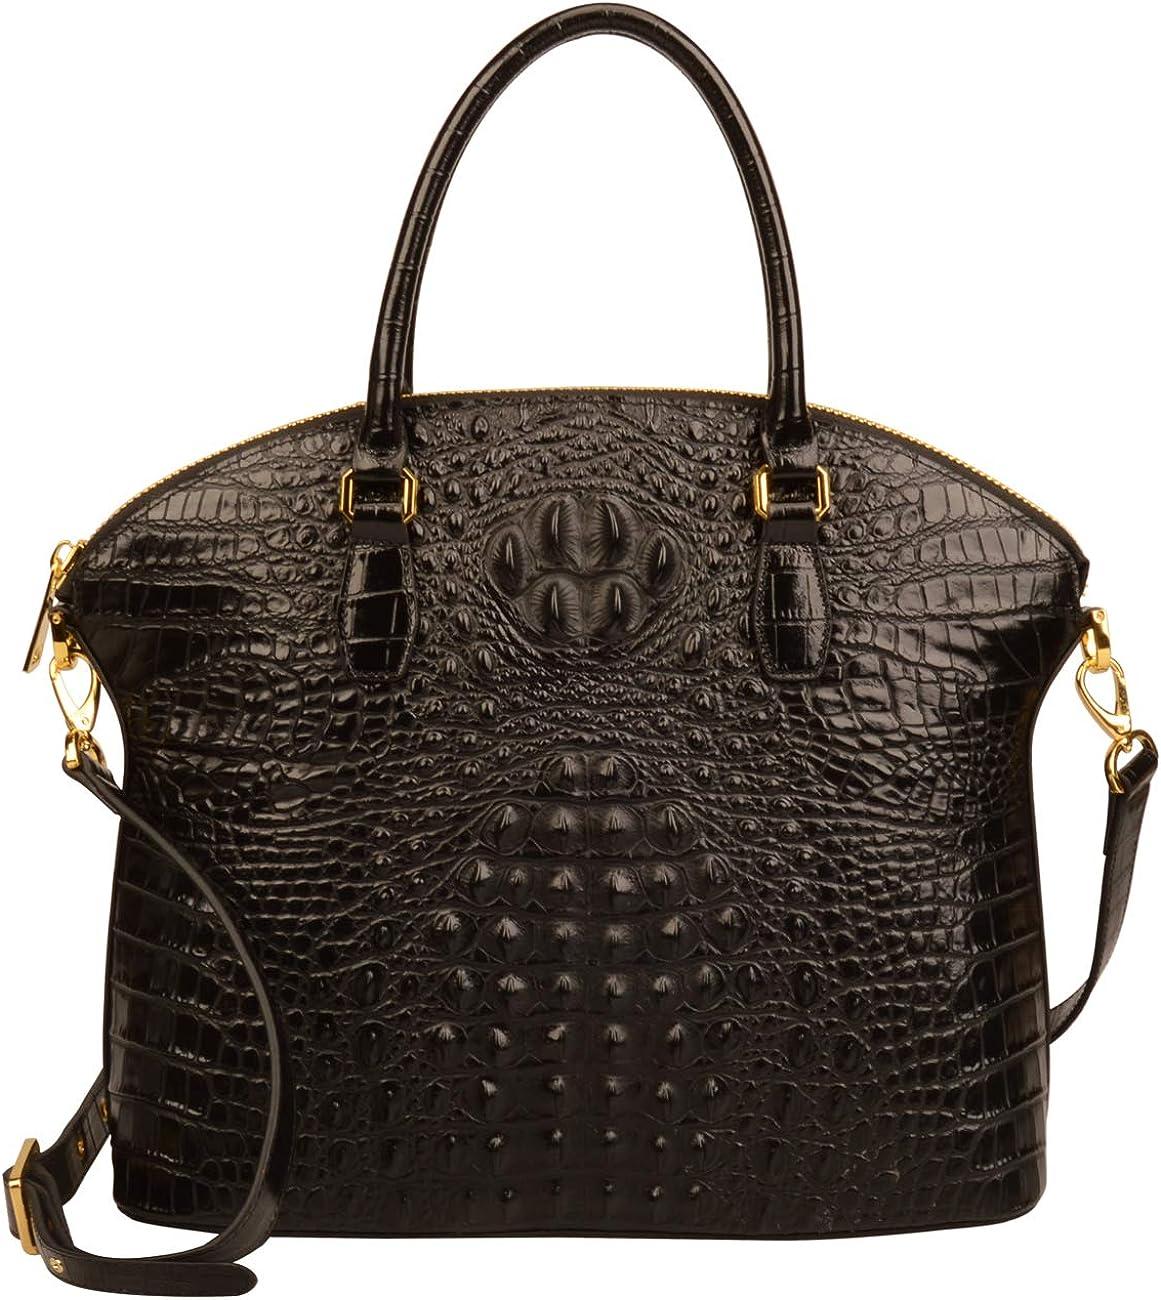 Ainifeel Women's Genuine Leather Crocodile Embossed Large Top Handle Handbags Business Handbags